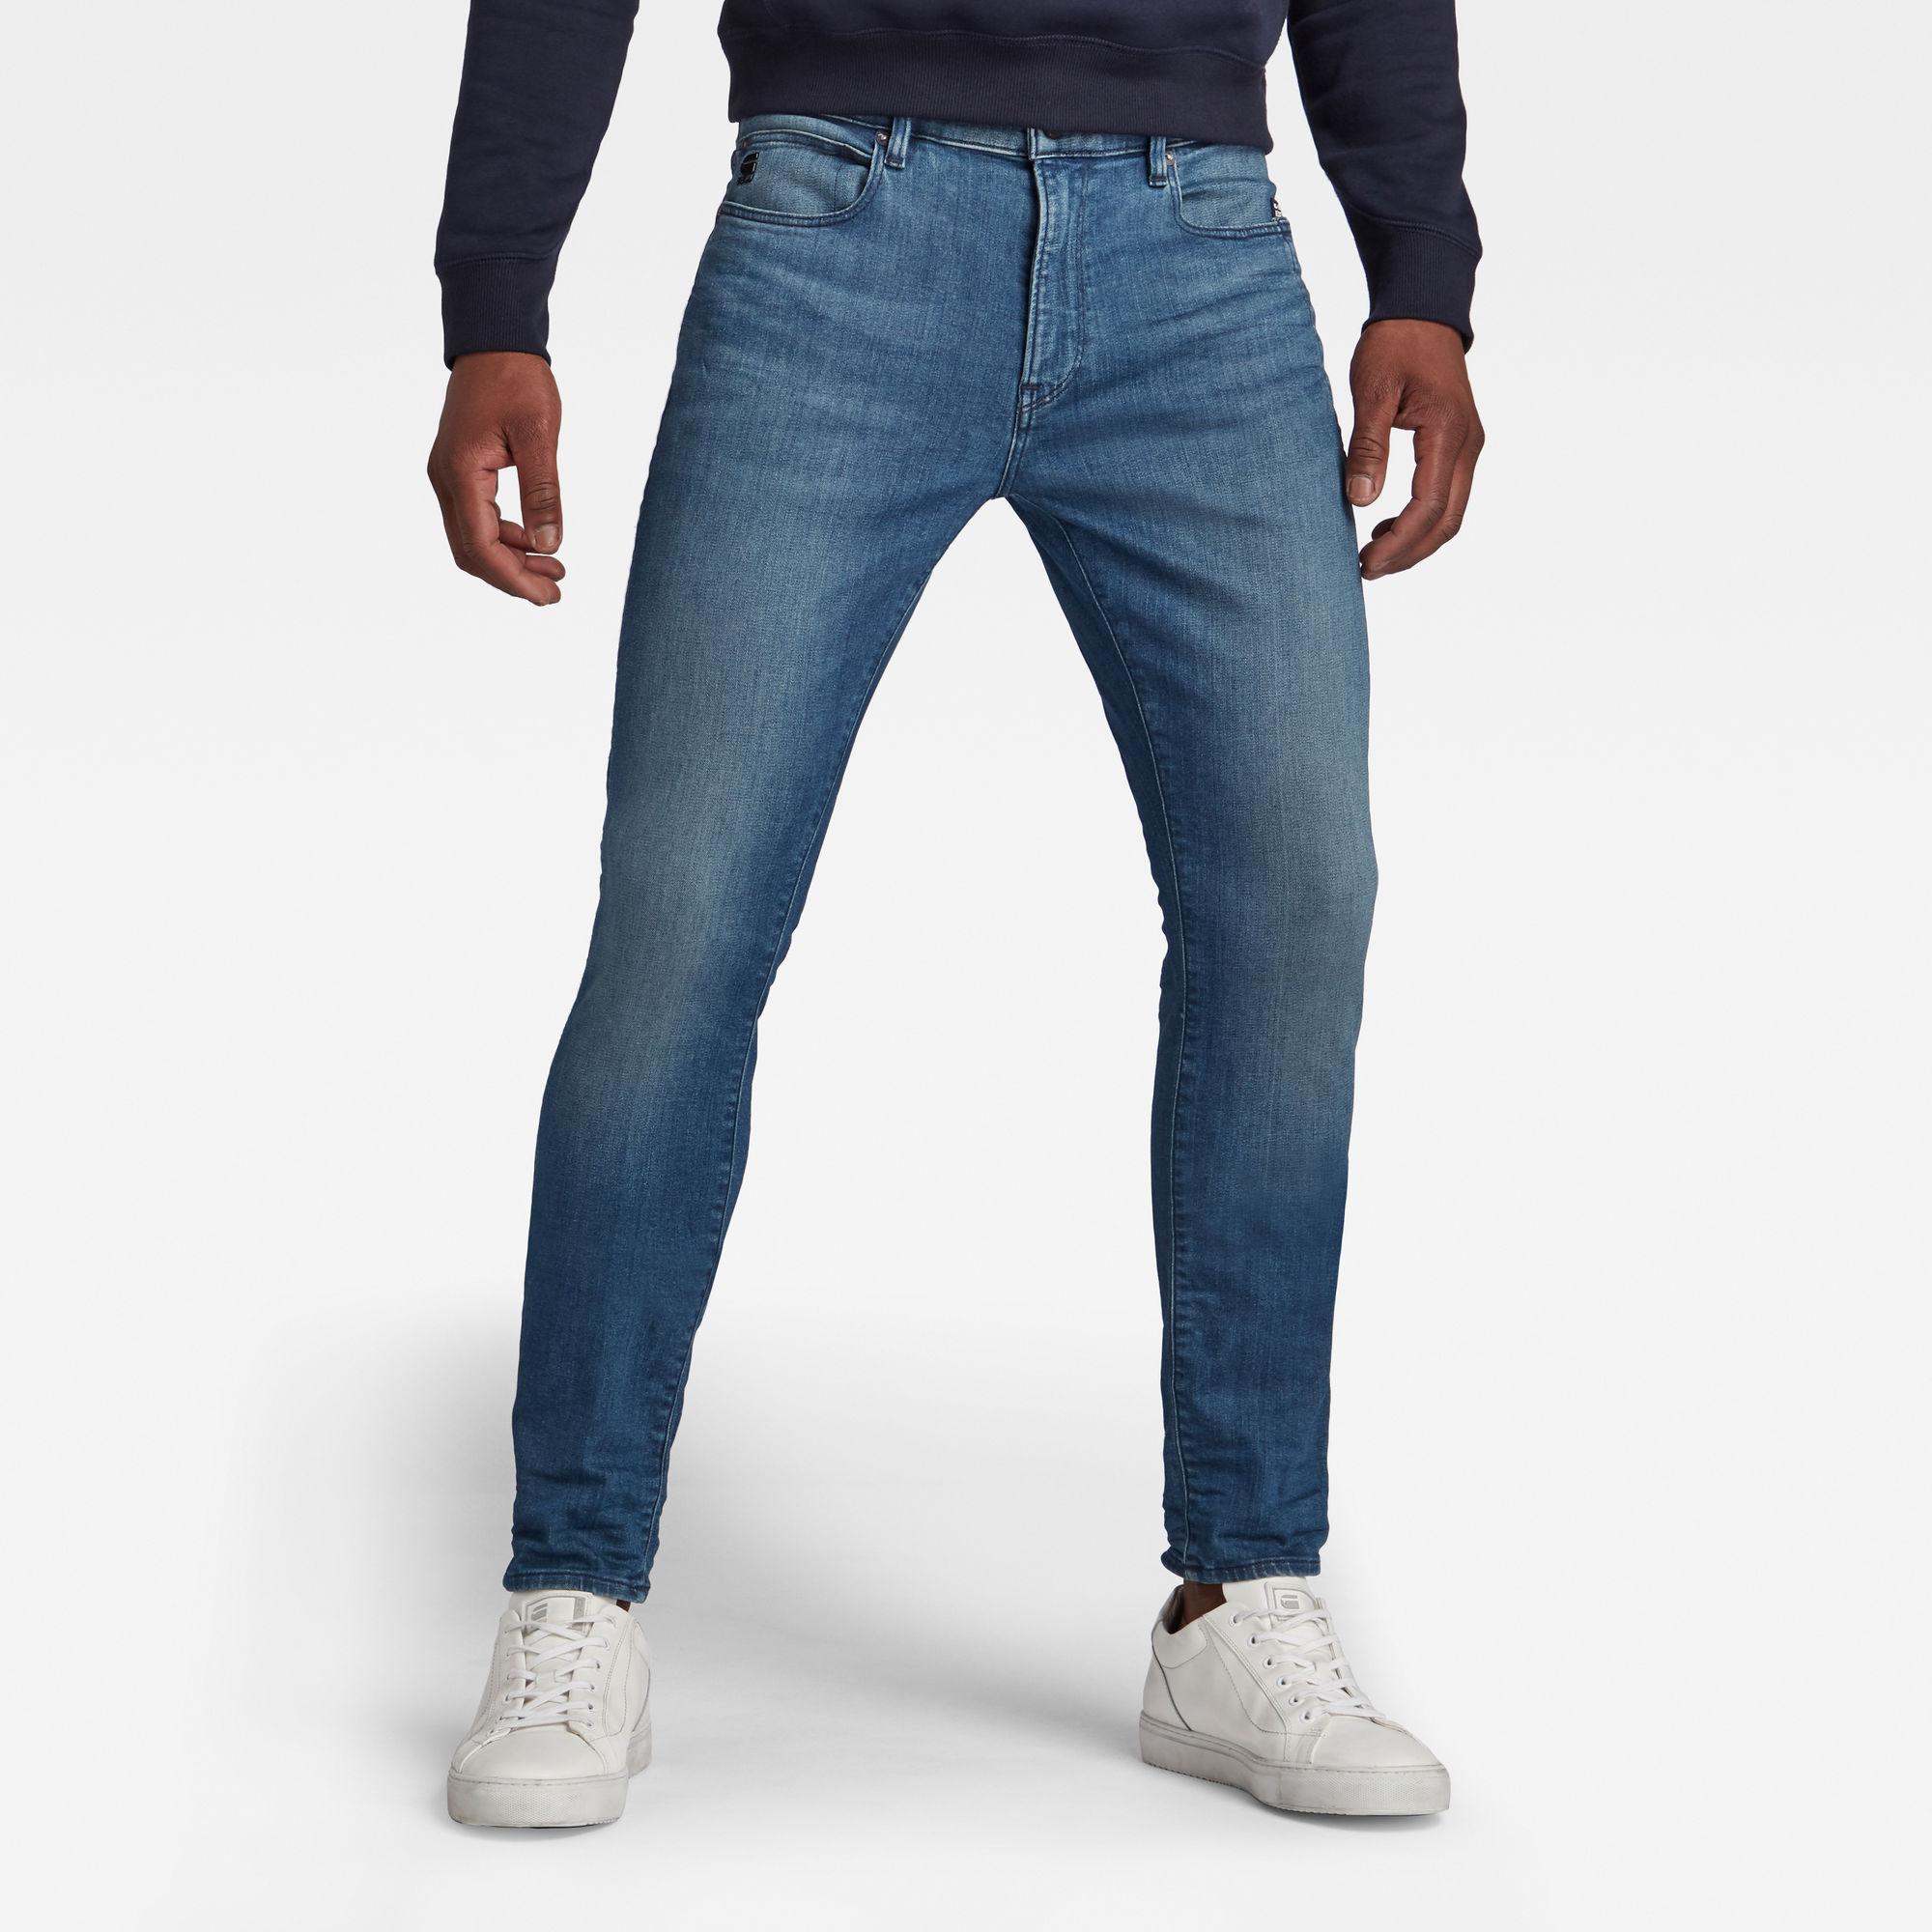 G-Star RAW Heren Lancet Skinny Jeans Blauw